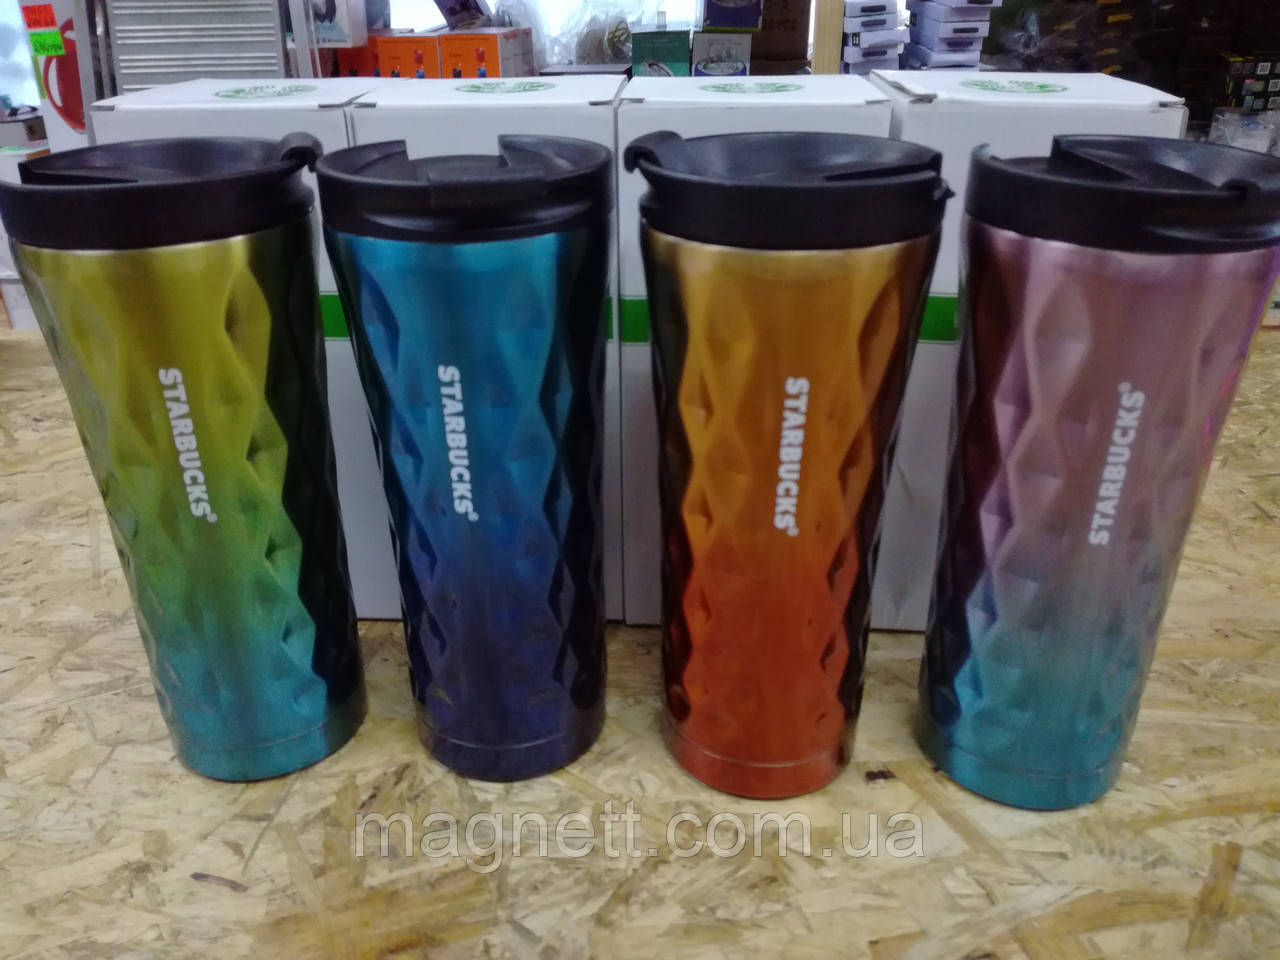 Термо чашка Starbucks Старбакс фигурная цветная 500 мл